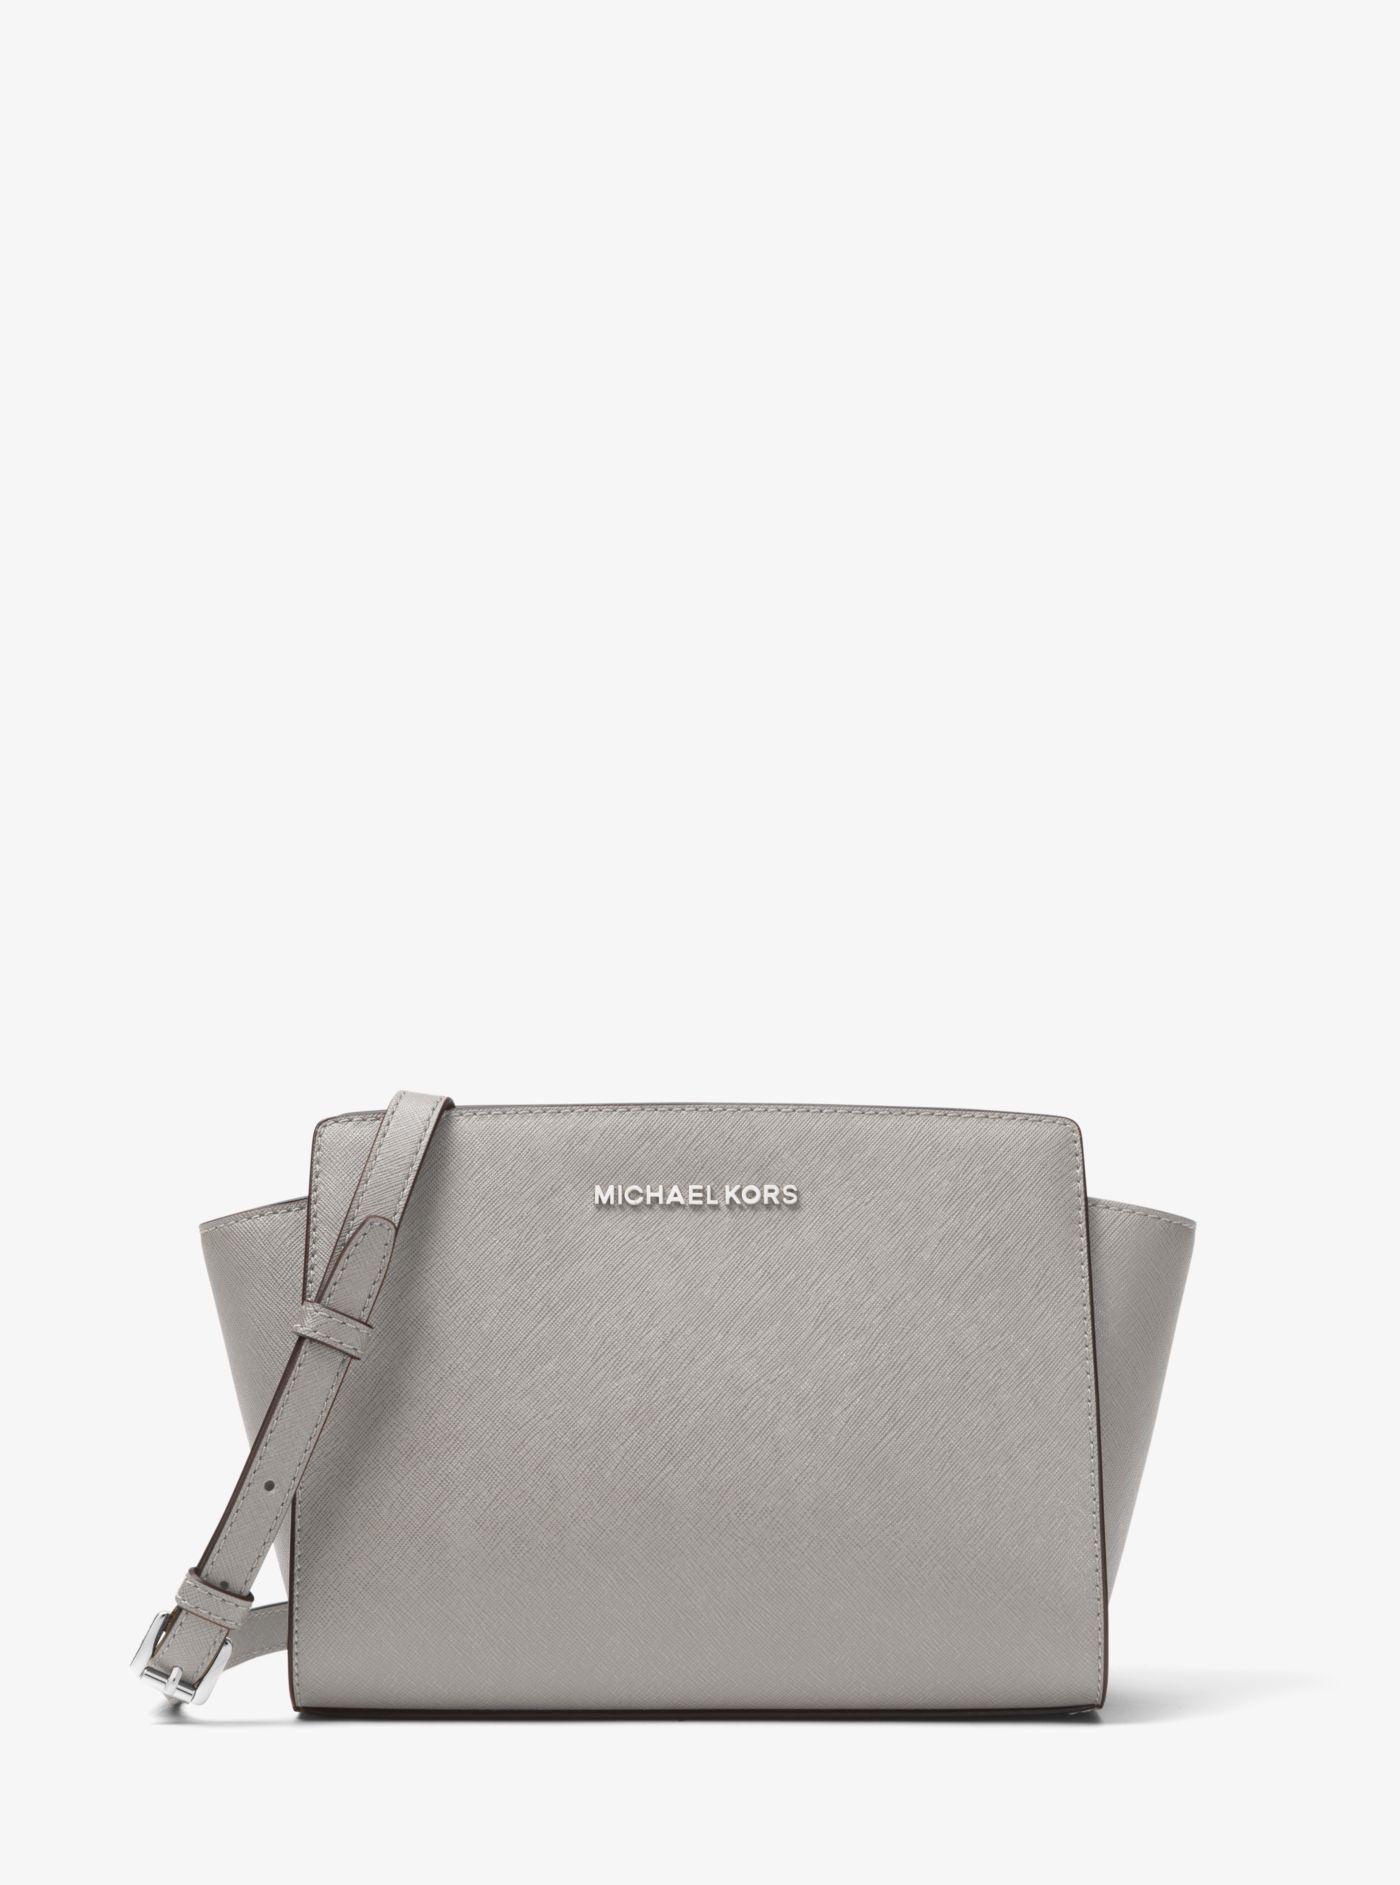 ... clearance michael kors gray selma medium metallic leather crossbody lyst.  view fullscreen 92878 2ae88 8efd96fedb4b0